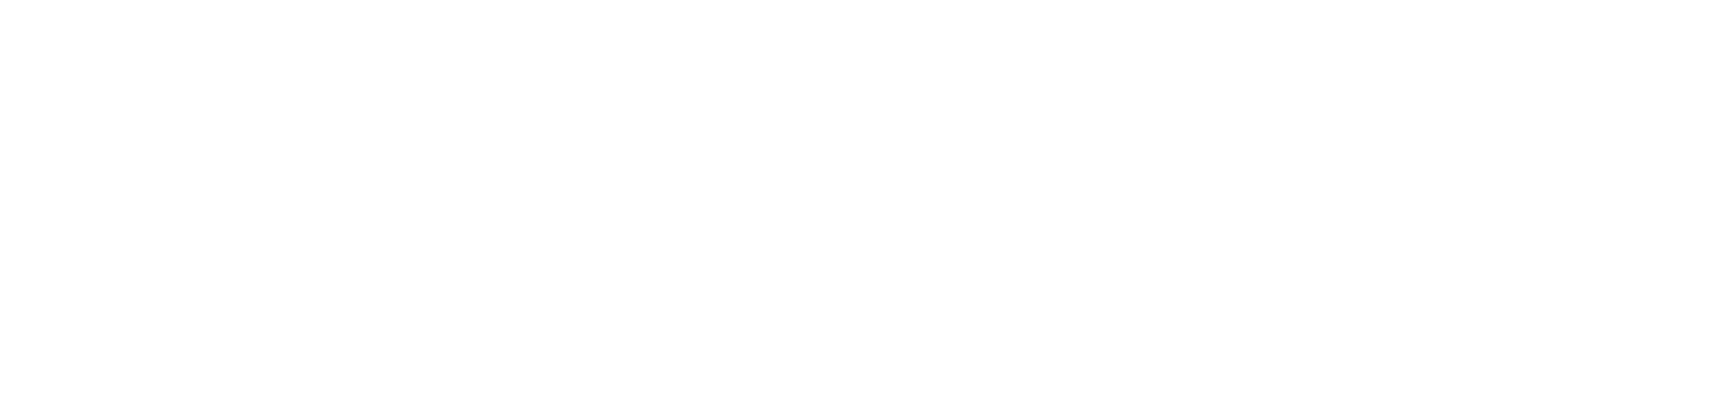 s7health logo biale - Kujawsko-Pomorskie